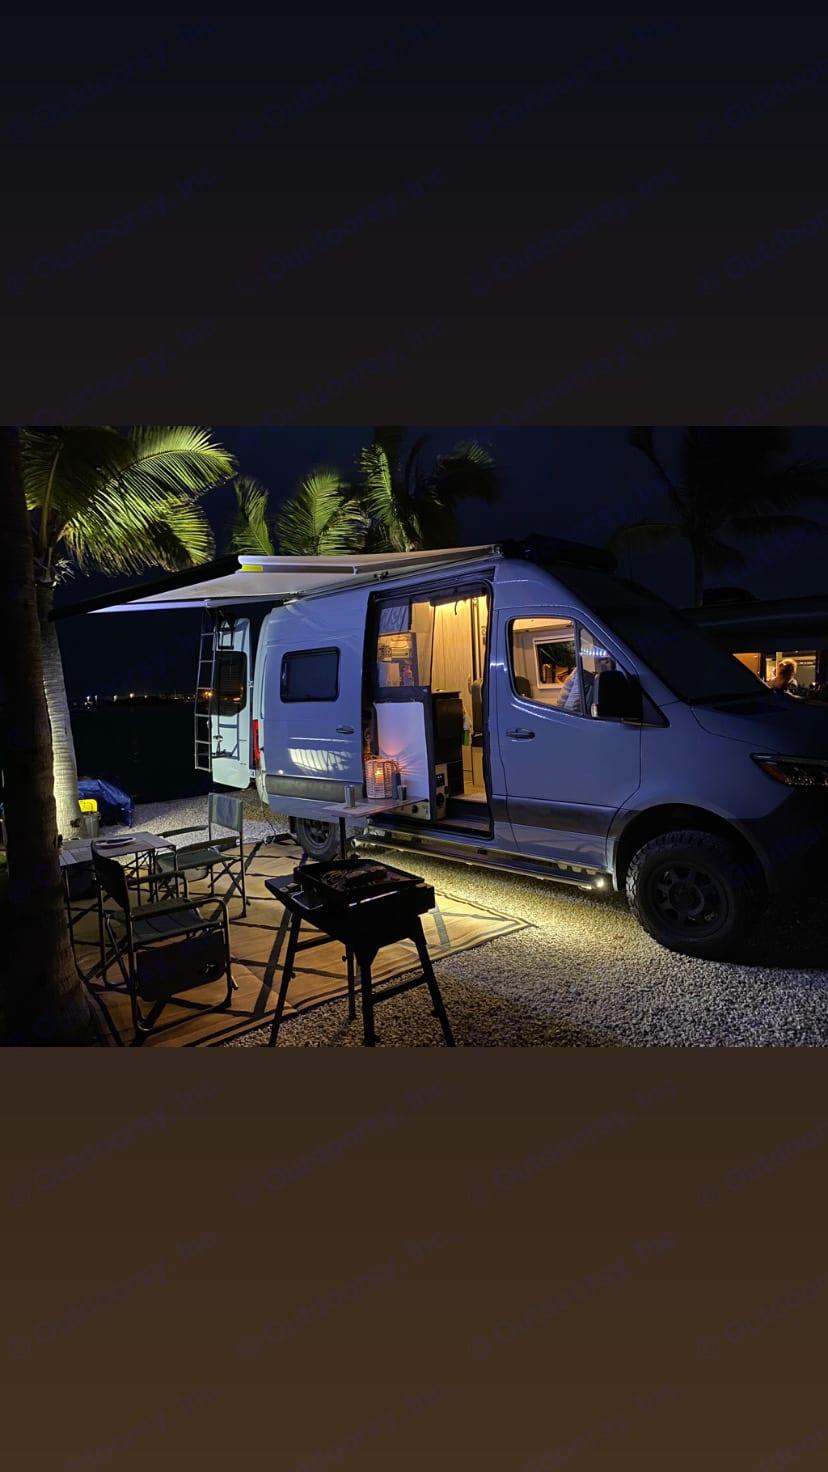 BlackStone Grill w/Awning Lights. Winnebago Revel 4x4 2020